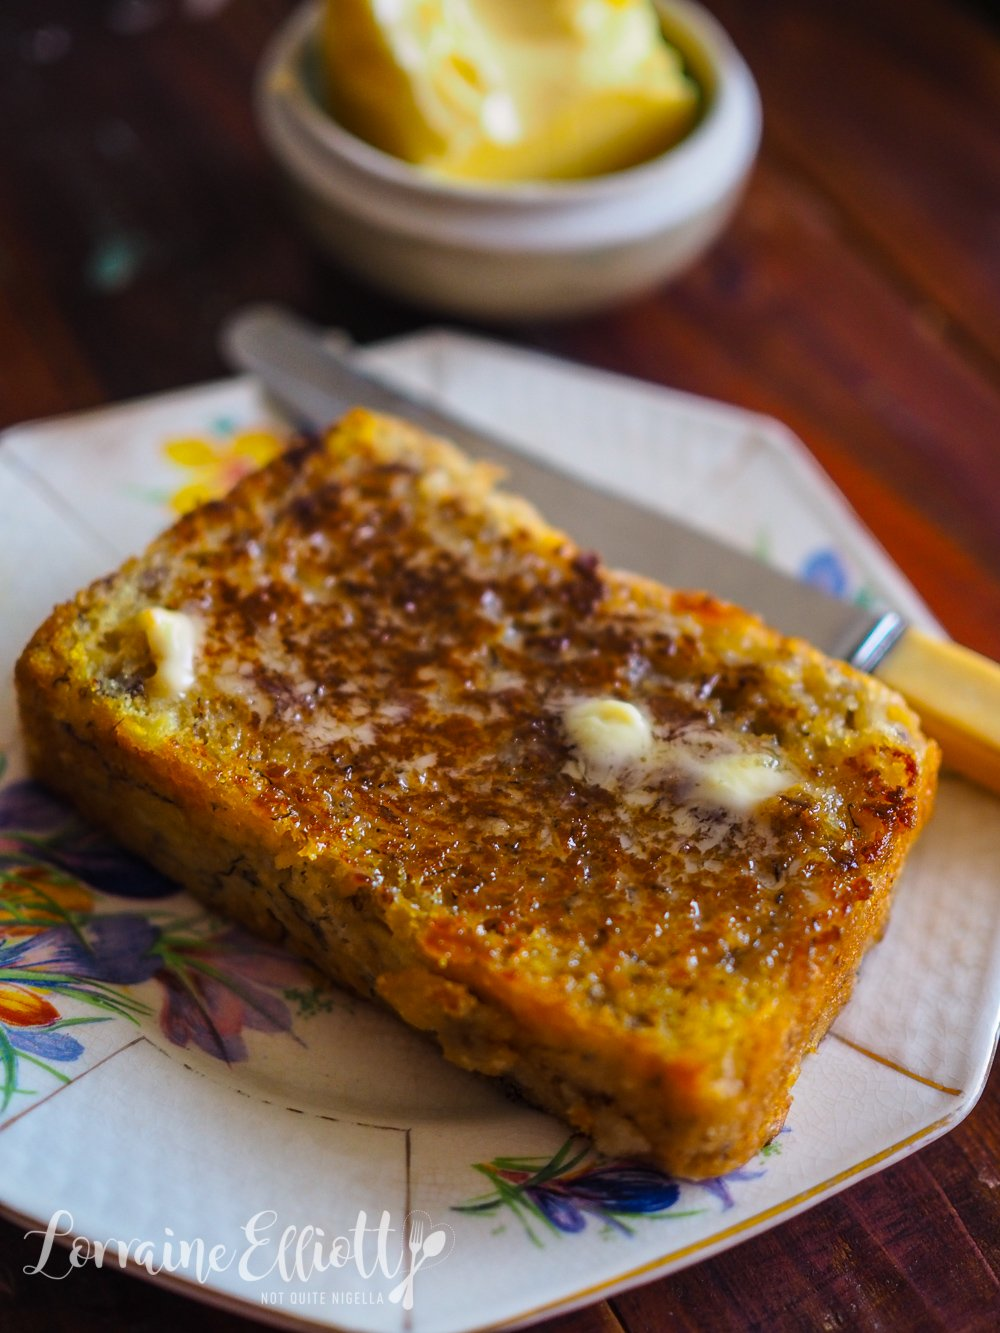 Top 5 Banana Bread Recipes